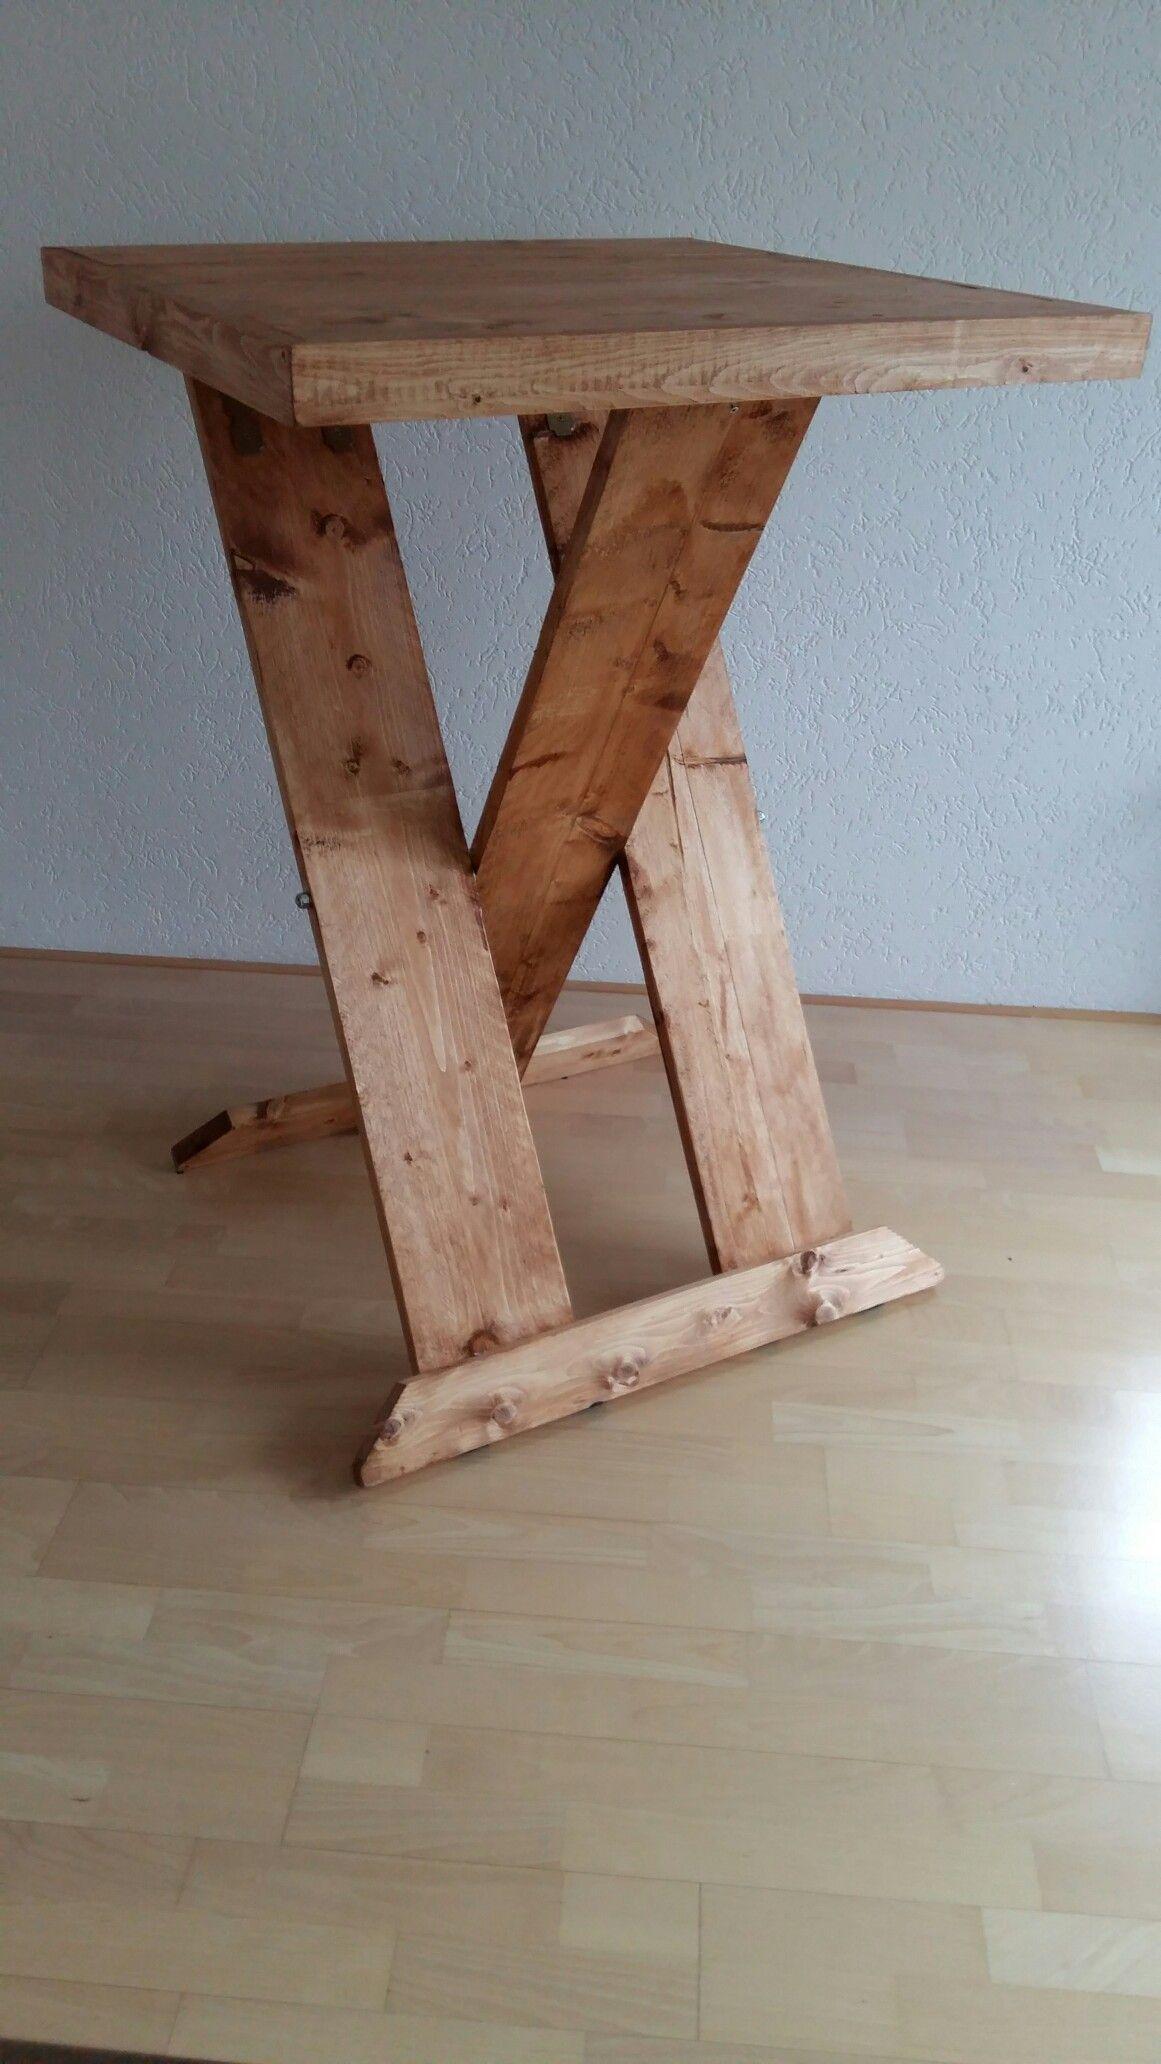 Steigerhouten Statafel Inklapbaar.Inklapbare Statafel Gemaakte Steigerhouten Ideeen In 2019